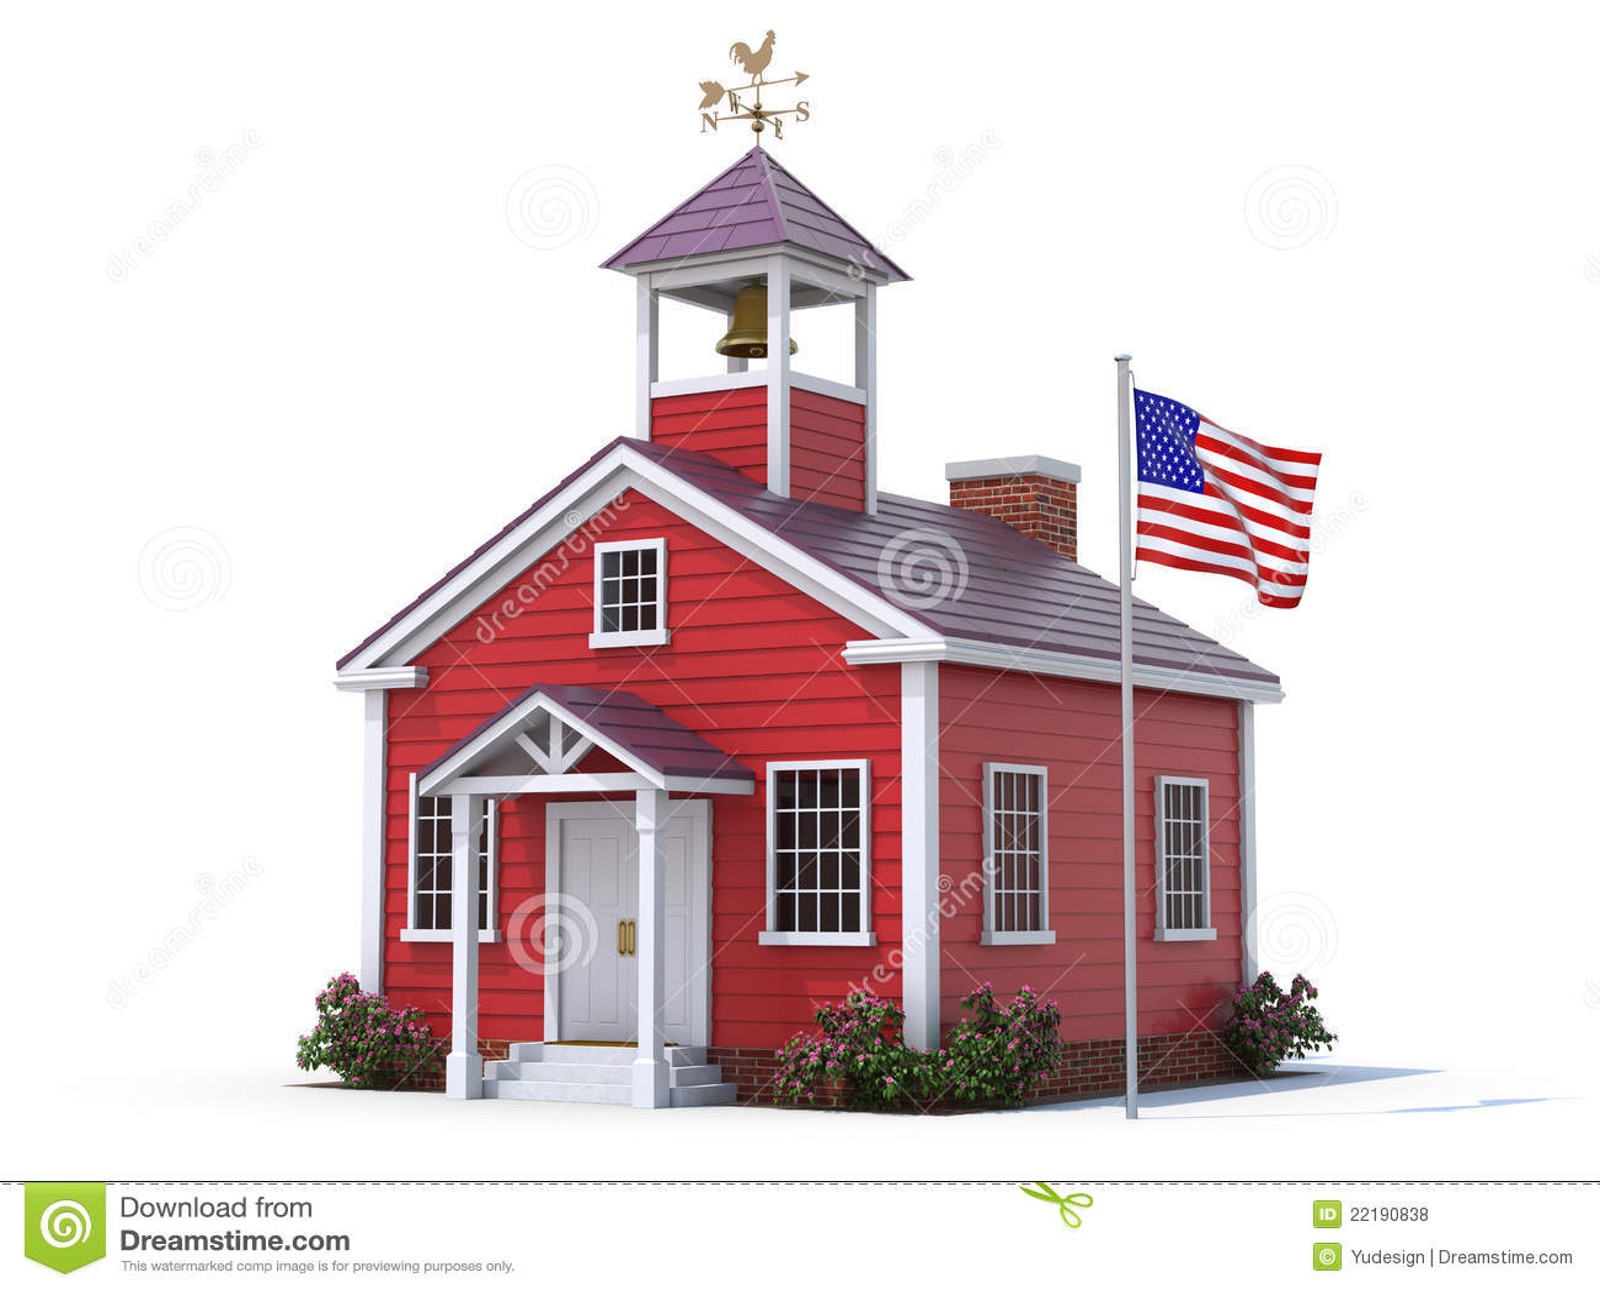 School House Royalty Free Stock Photos Image 22190838